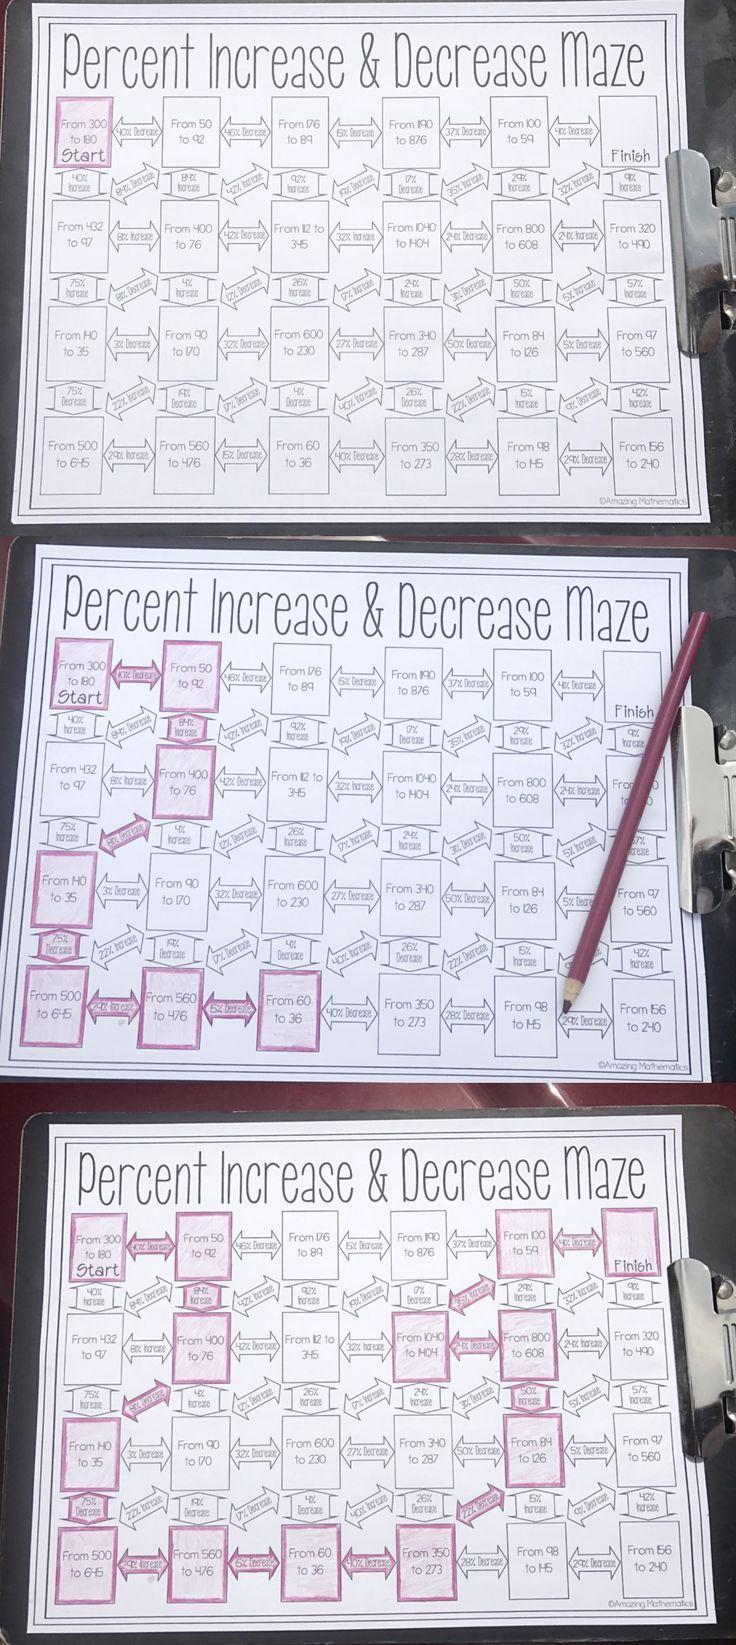 Percent Increase and Decrease Maze Worksheet 7th grade